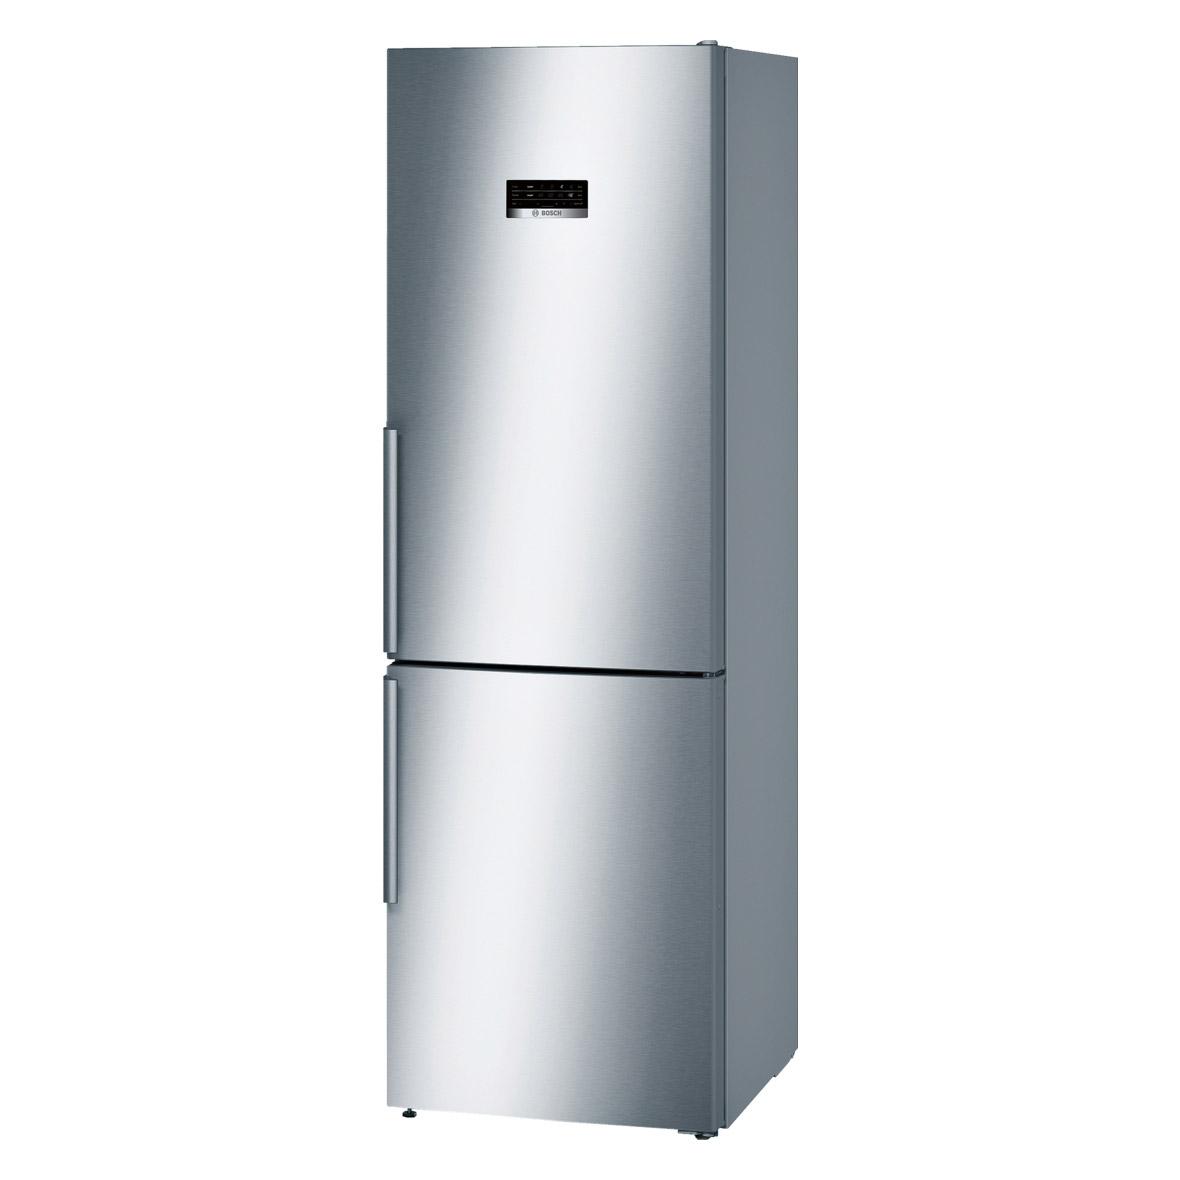 Bosch Serie 4 Kgn36xi35g Stainless Steel Easyclean Stainless Steel Fridge Fridge Freezers Refrigerator